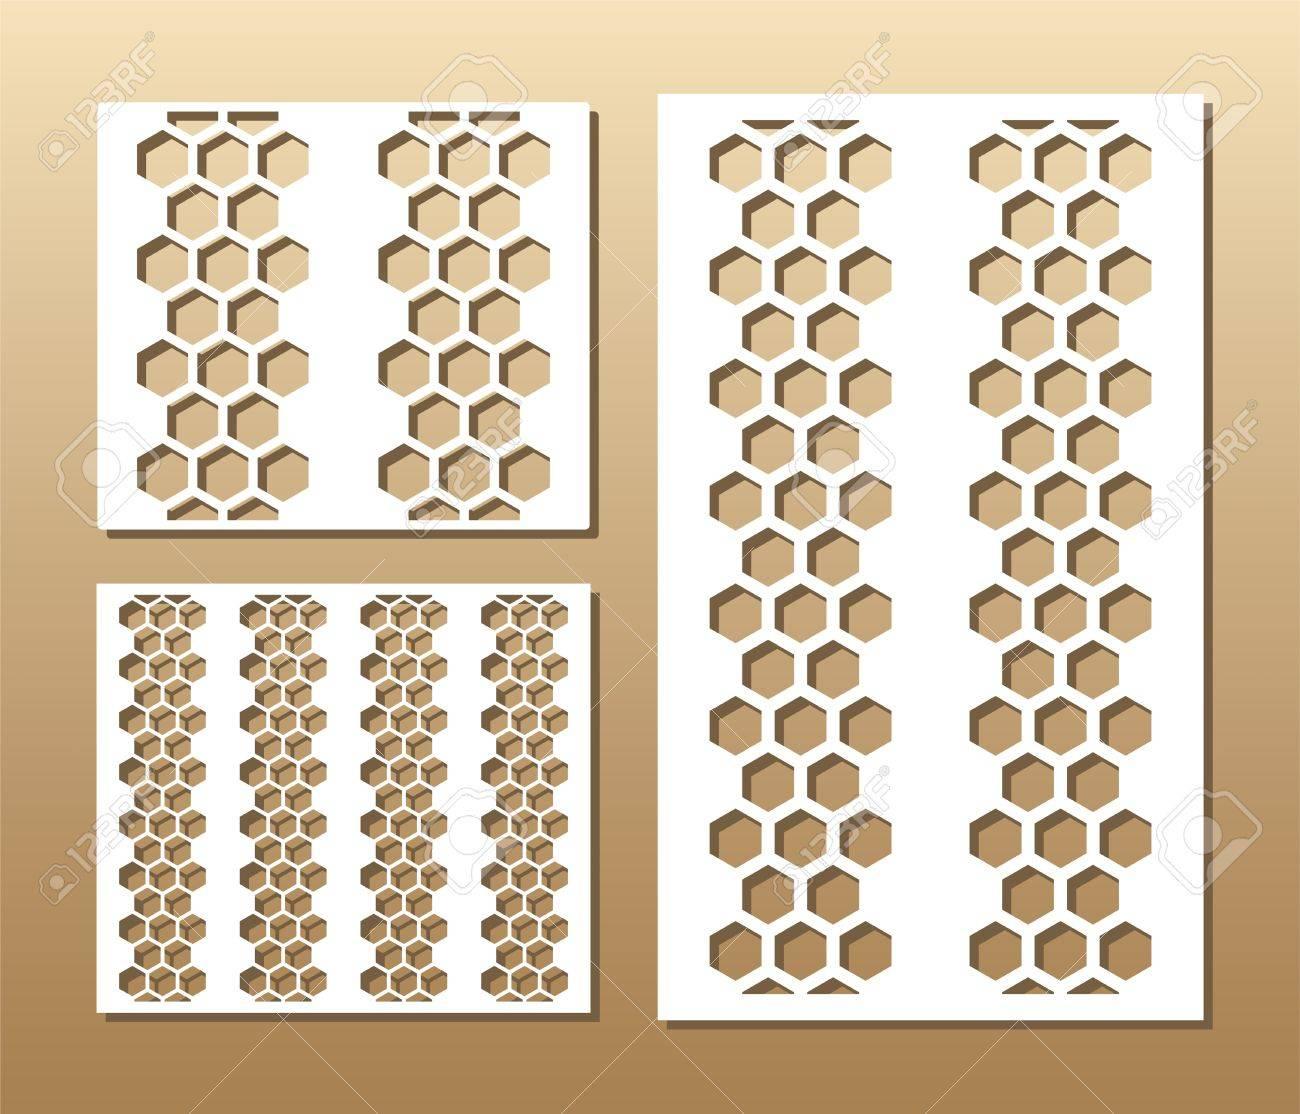 Die cut card  Laser cut vector panel  Cutout silhouette with